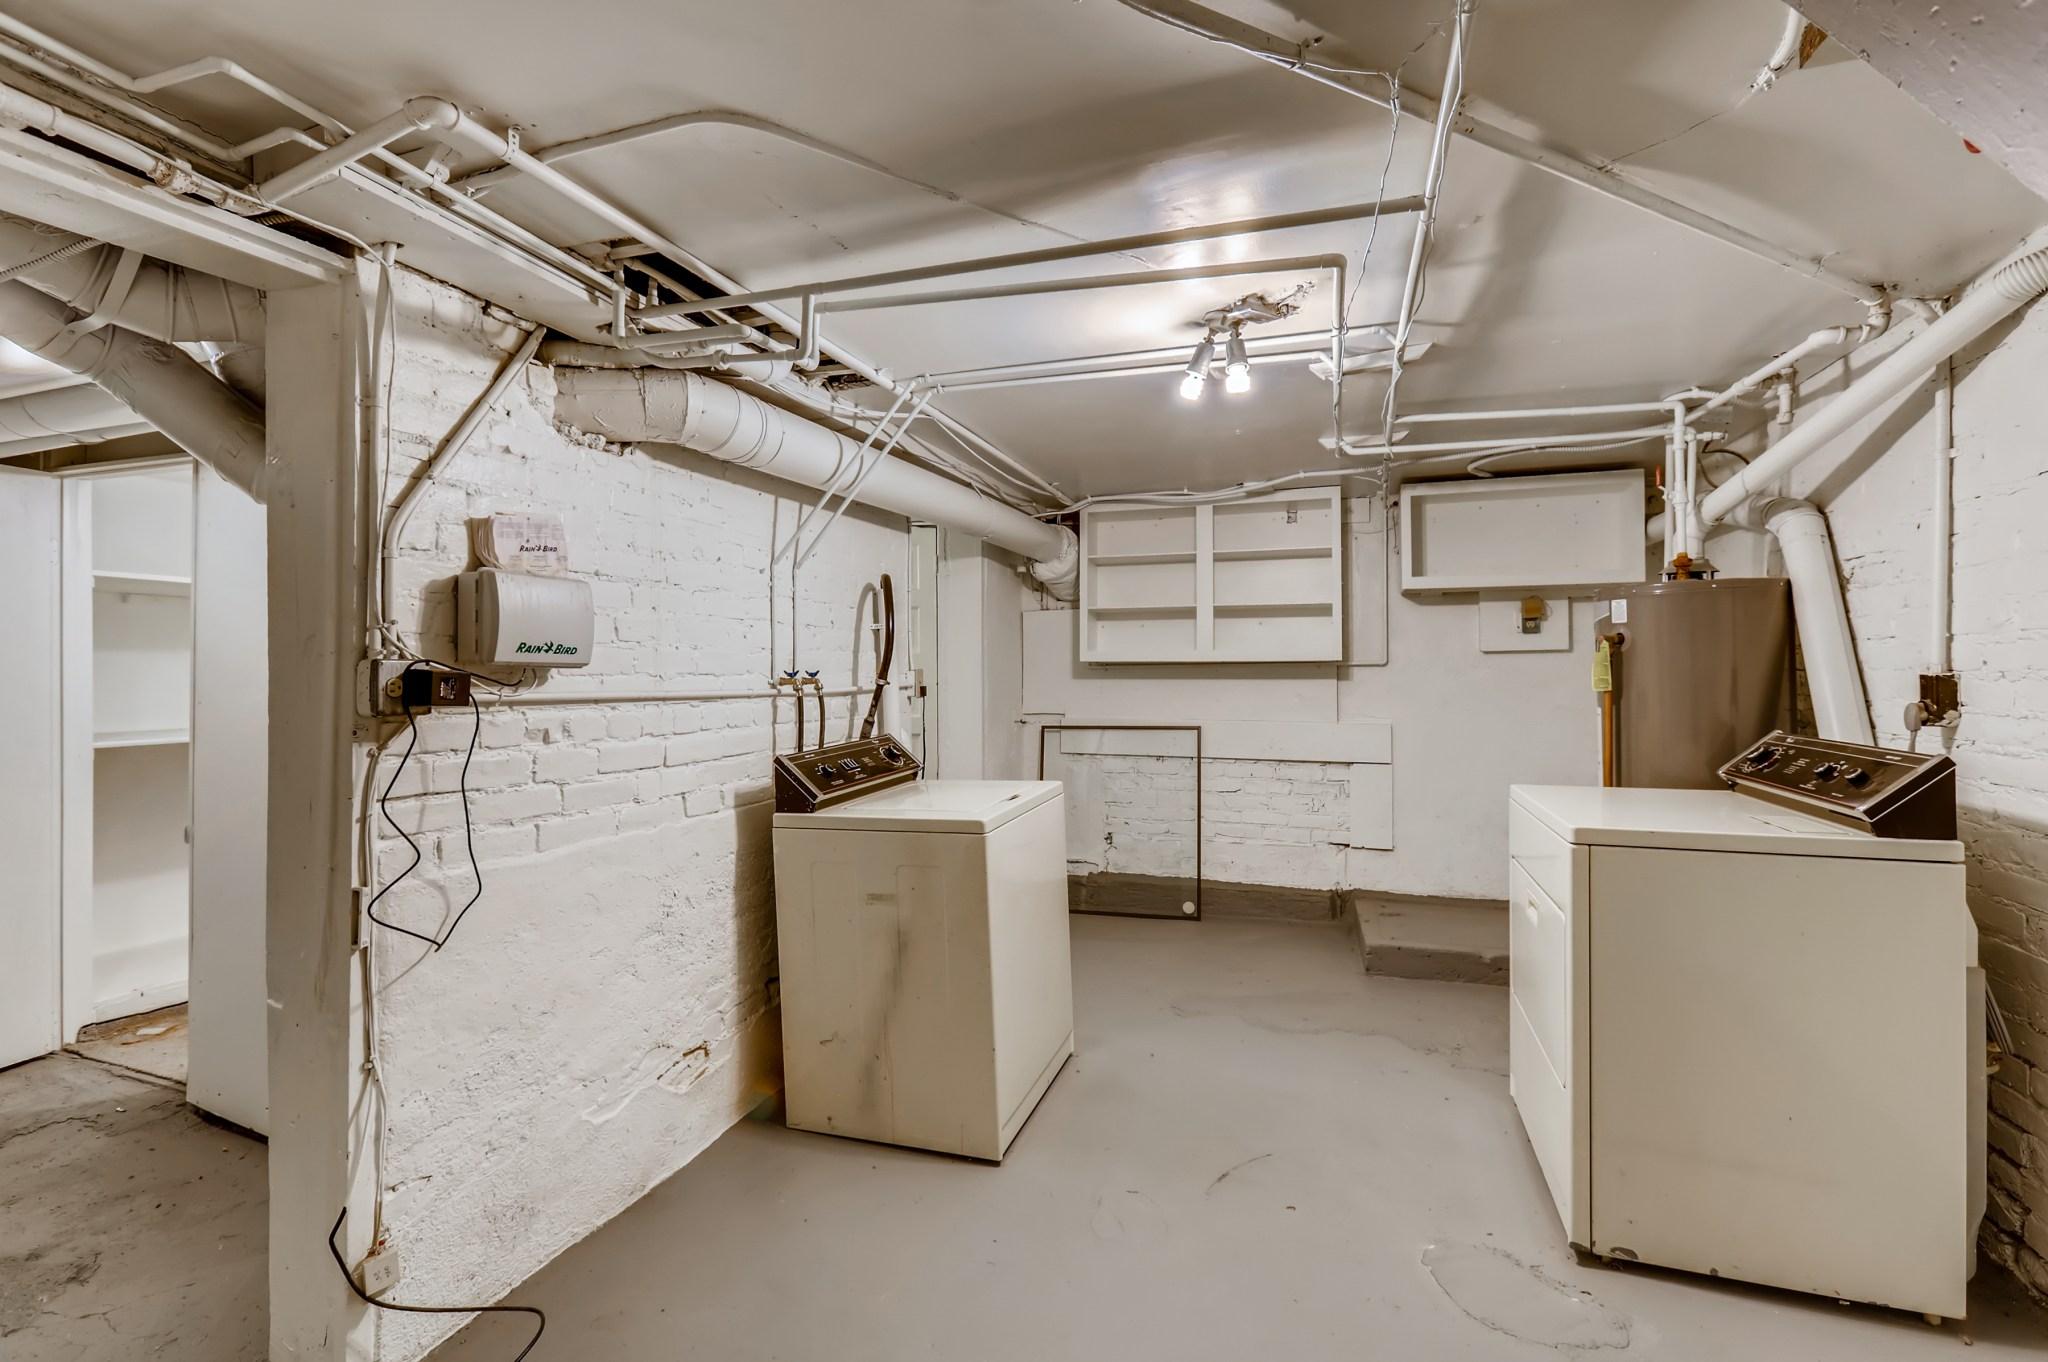 36-Lower-Level-Laundry-Room